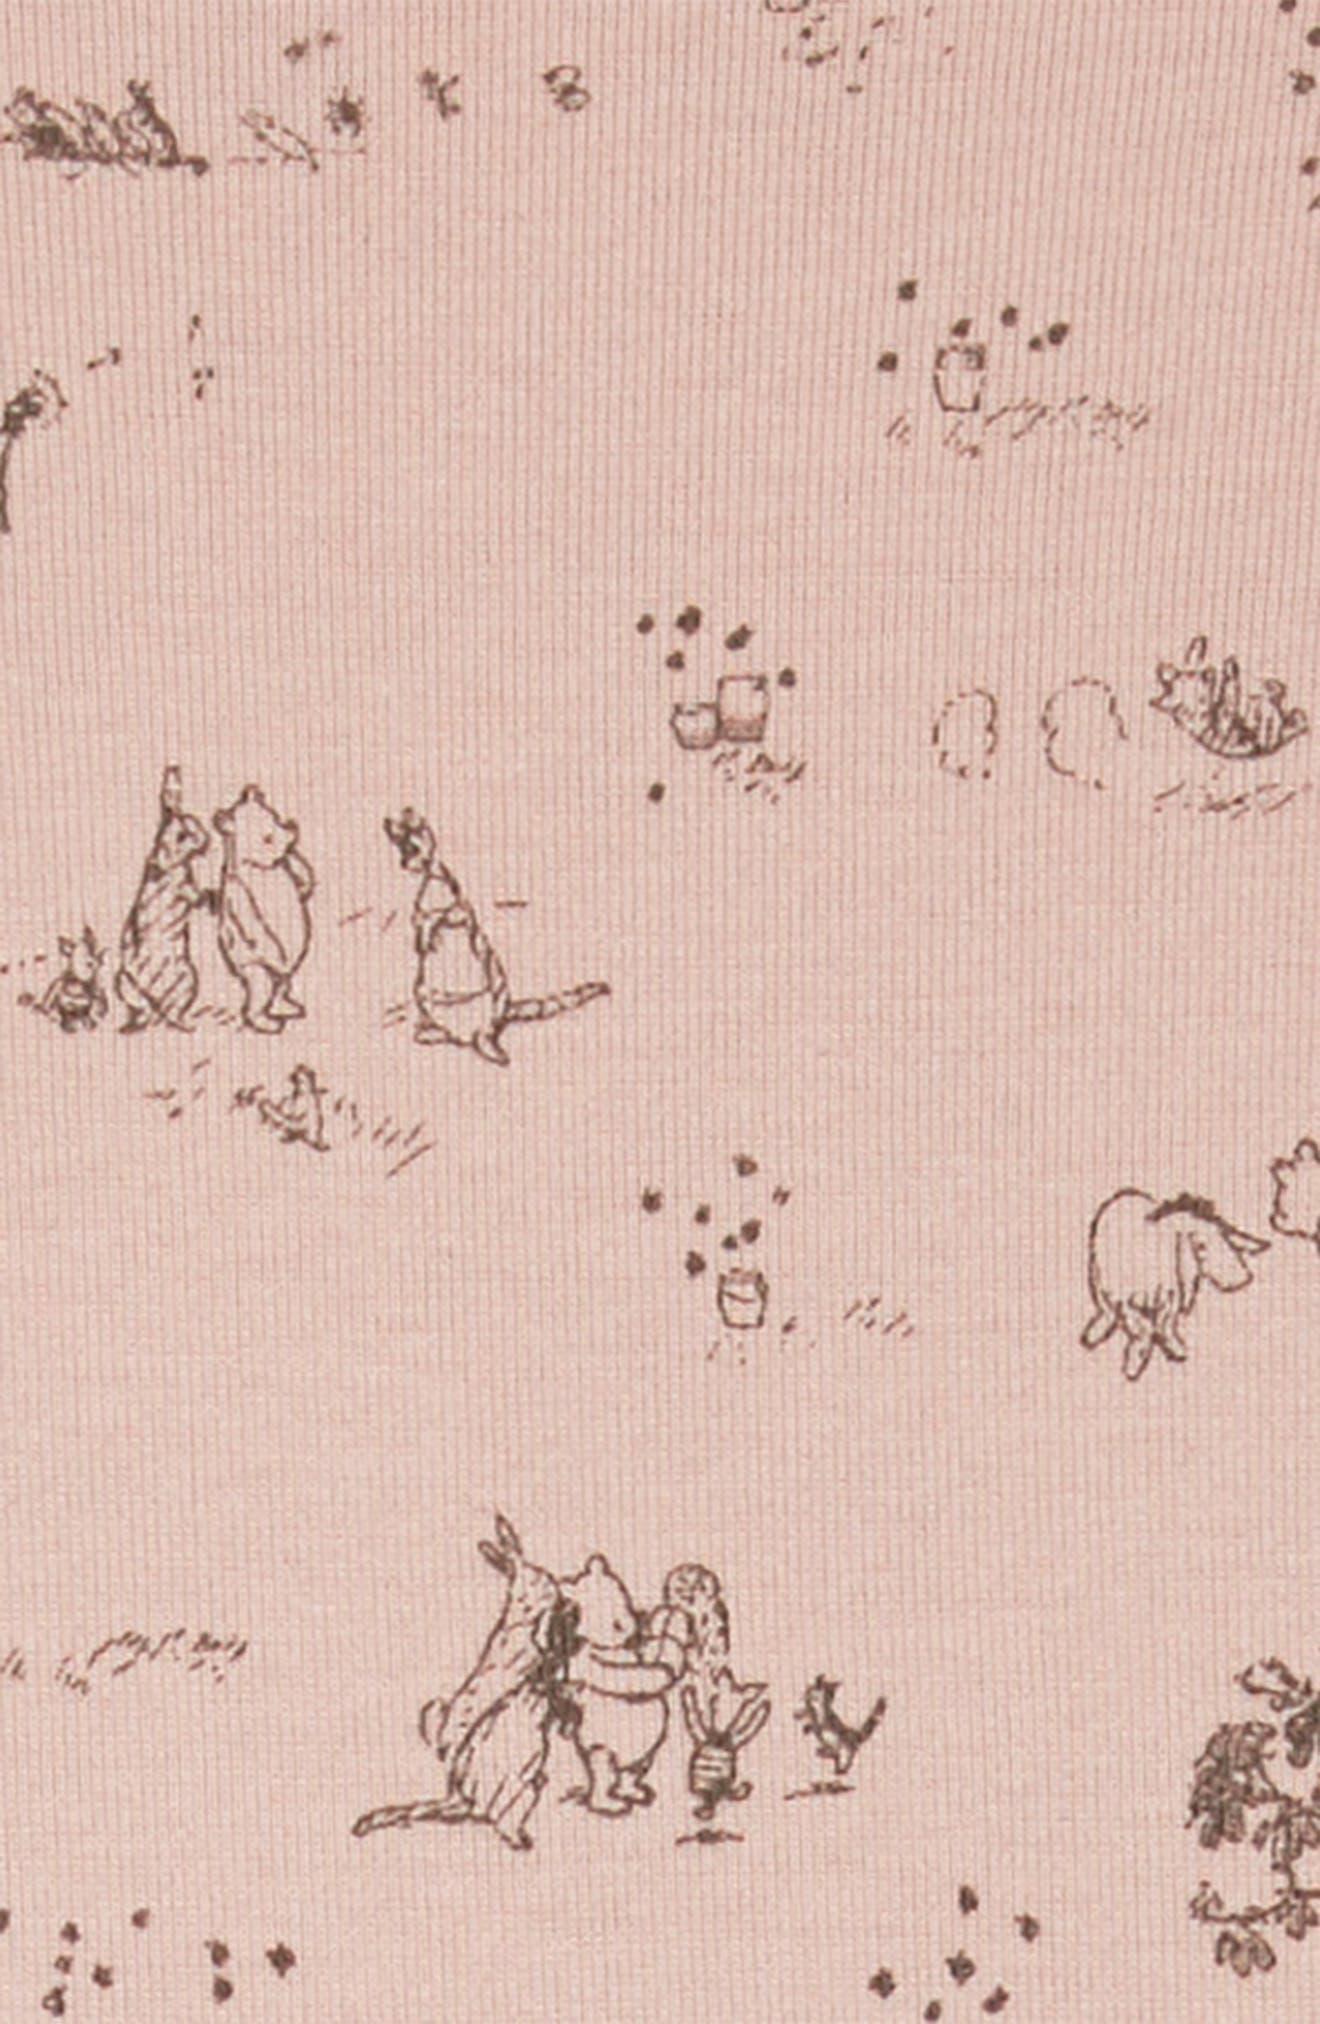 x Disney<sup>®</sup> Winnie the Pooh Print Dress,                             Alternate thumbnail 3, color,                             651